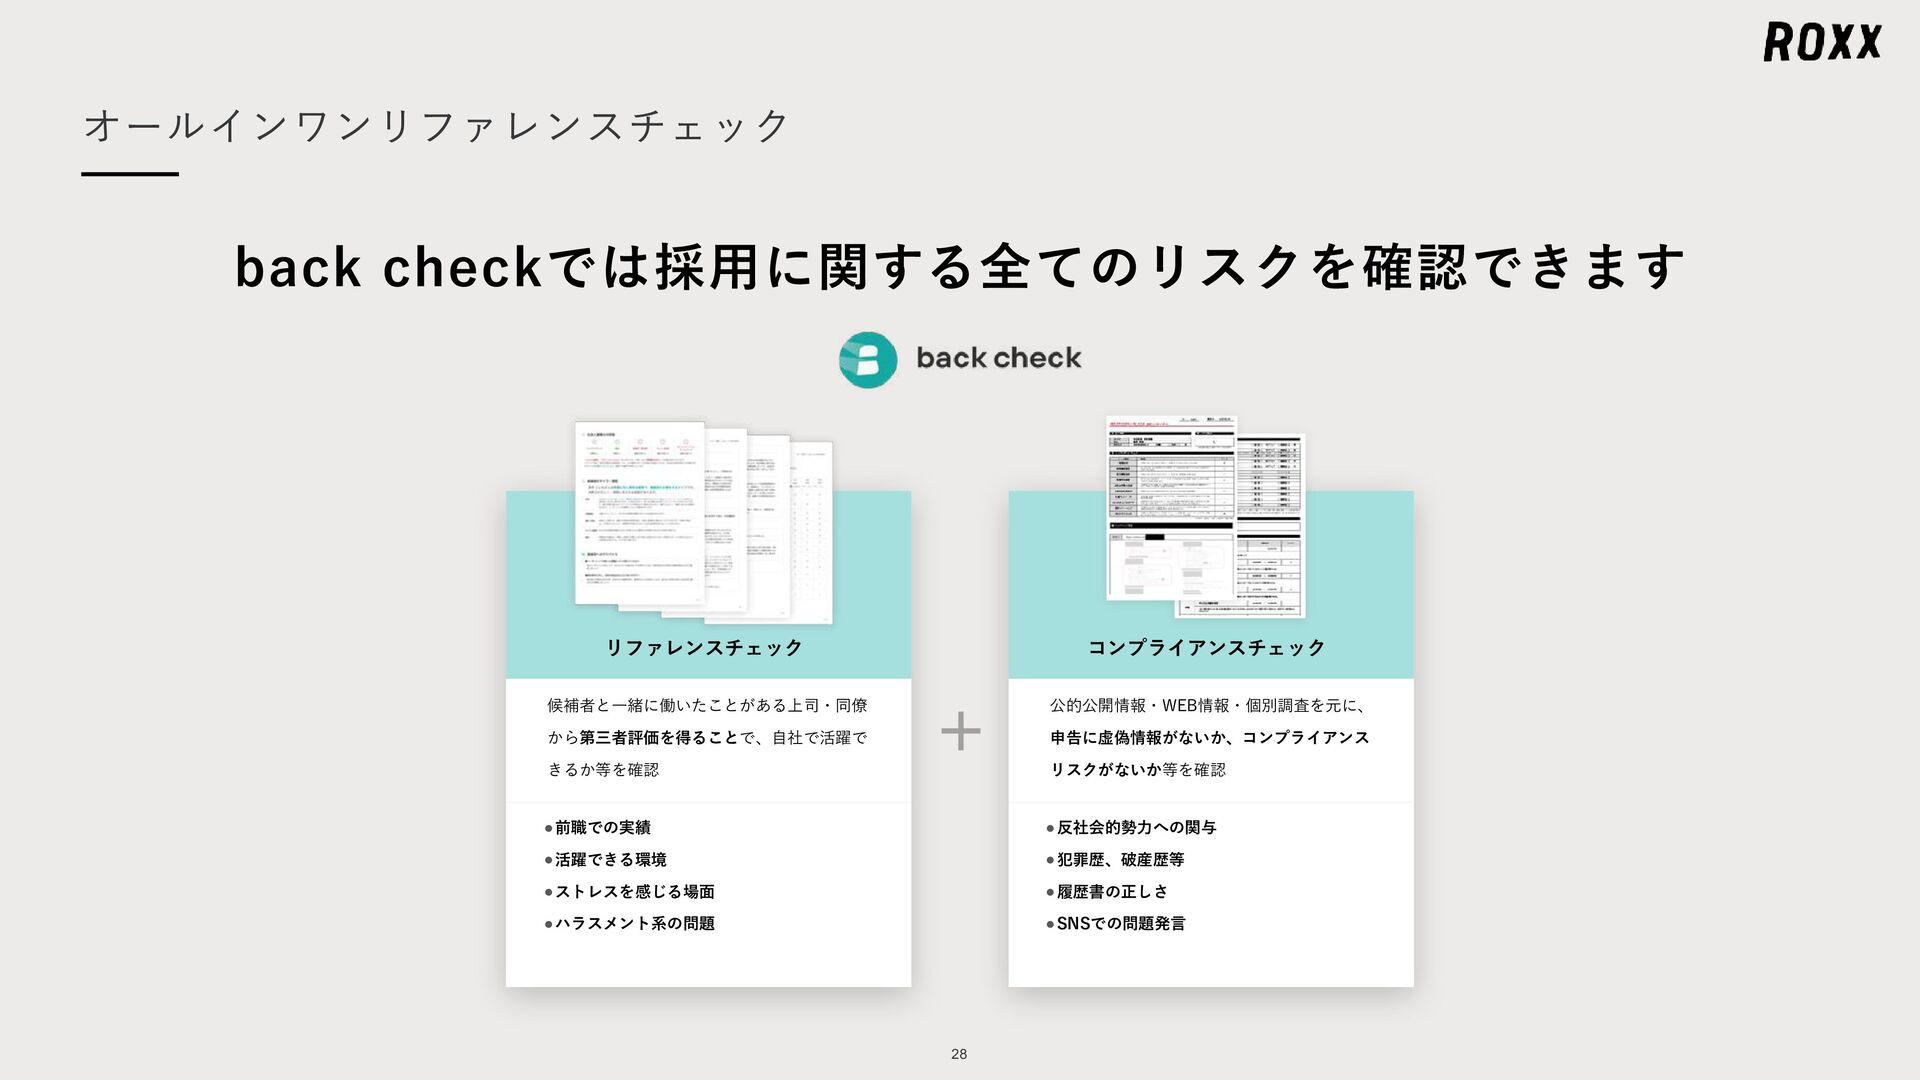 ࠾༻ʹ͓͚Δݱ࣮ ߴ͍৬ͱૣظ৬ 28 44% 19% 13% 18% 6% 1ϲ݄Ҏ...